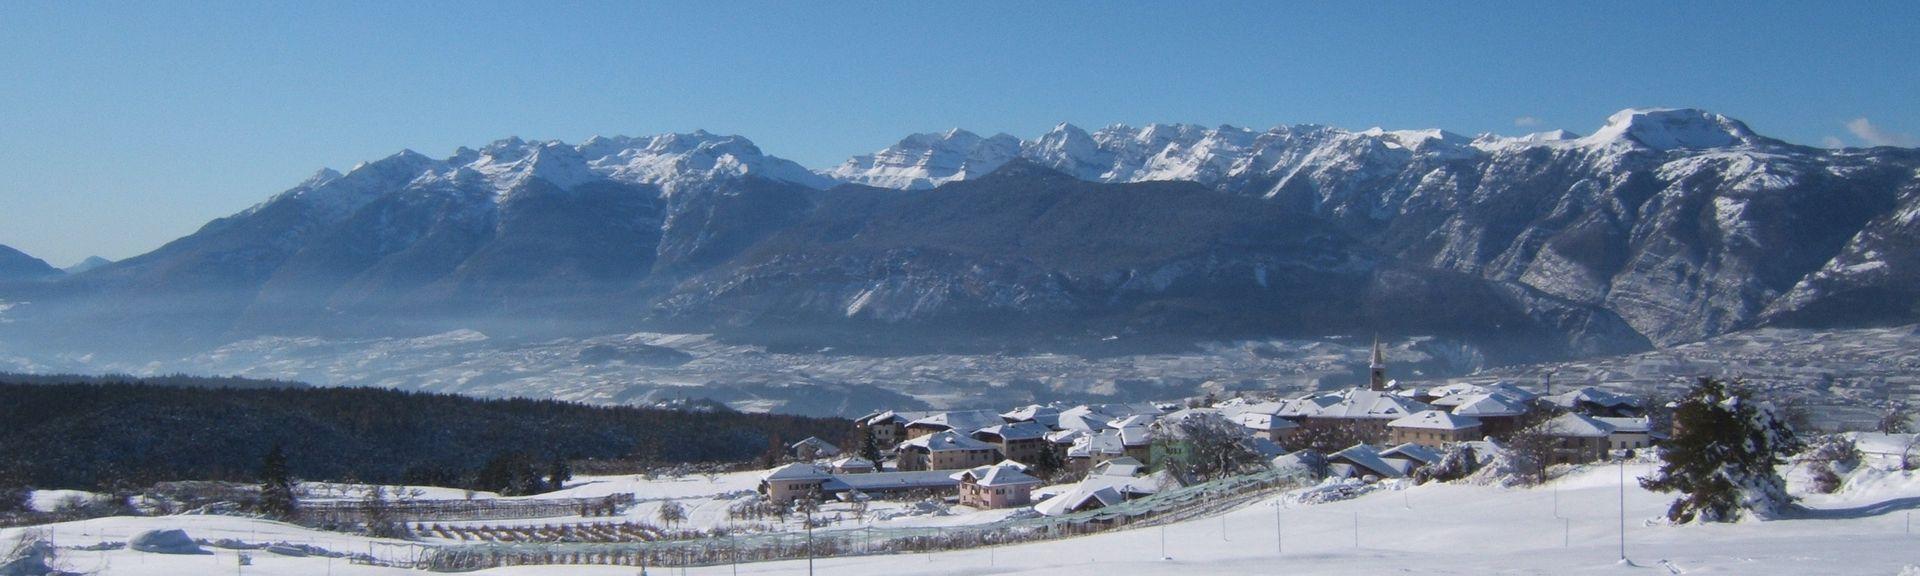 Ronzone, Trentino Alto Adige, Italia